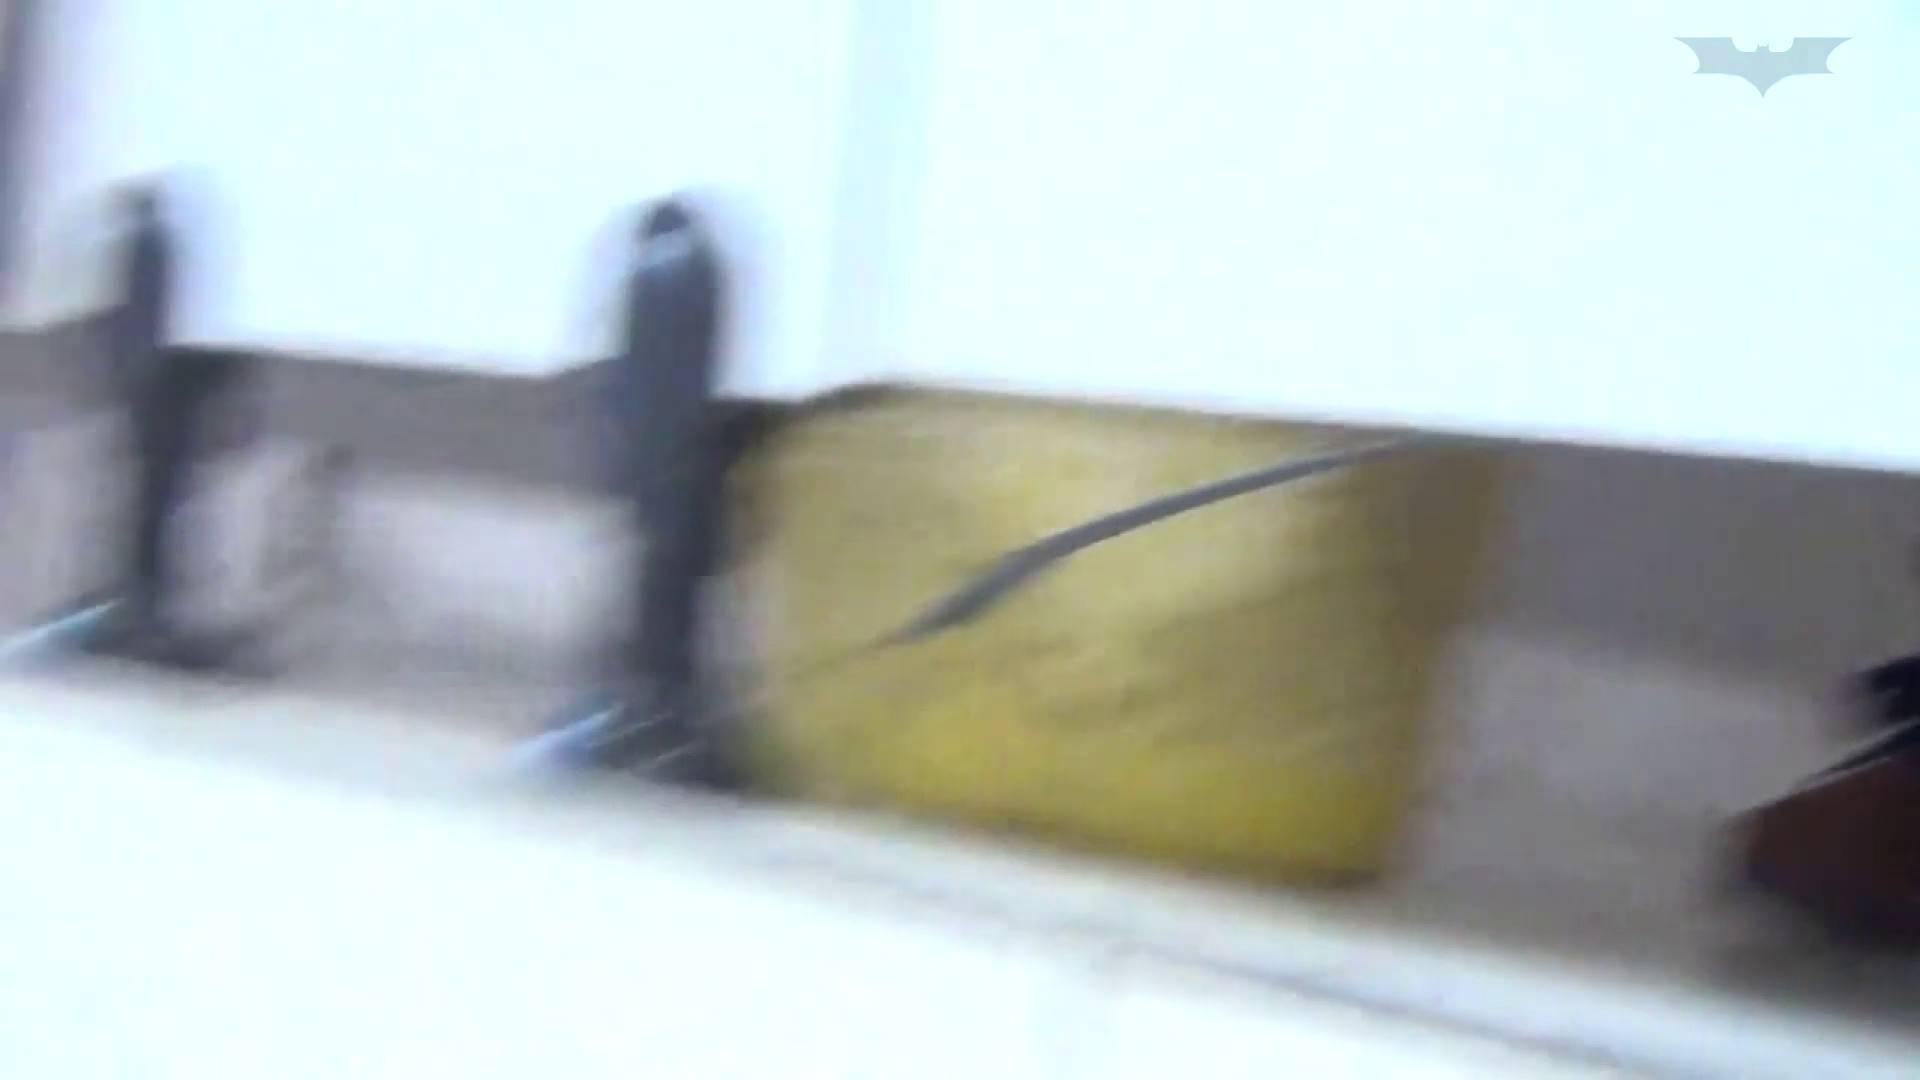 JD盗撮 美女の洗面所の秘密 Vol.42 トイレのぞき ワレメ無修正動画無料 98画像 79